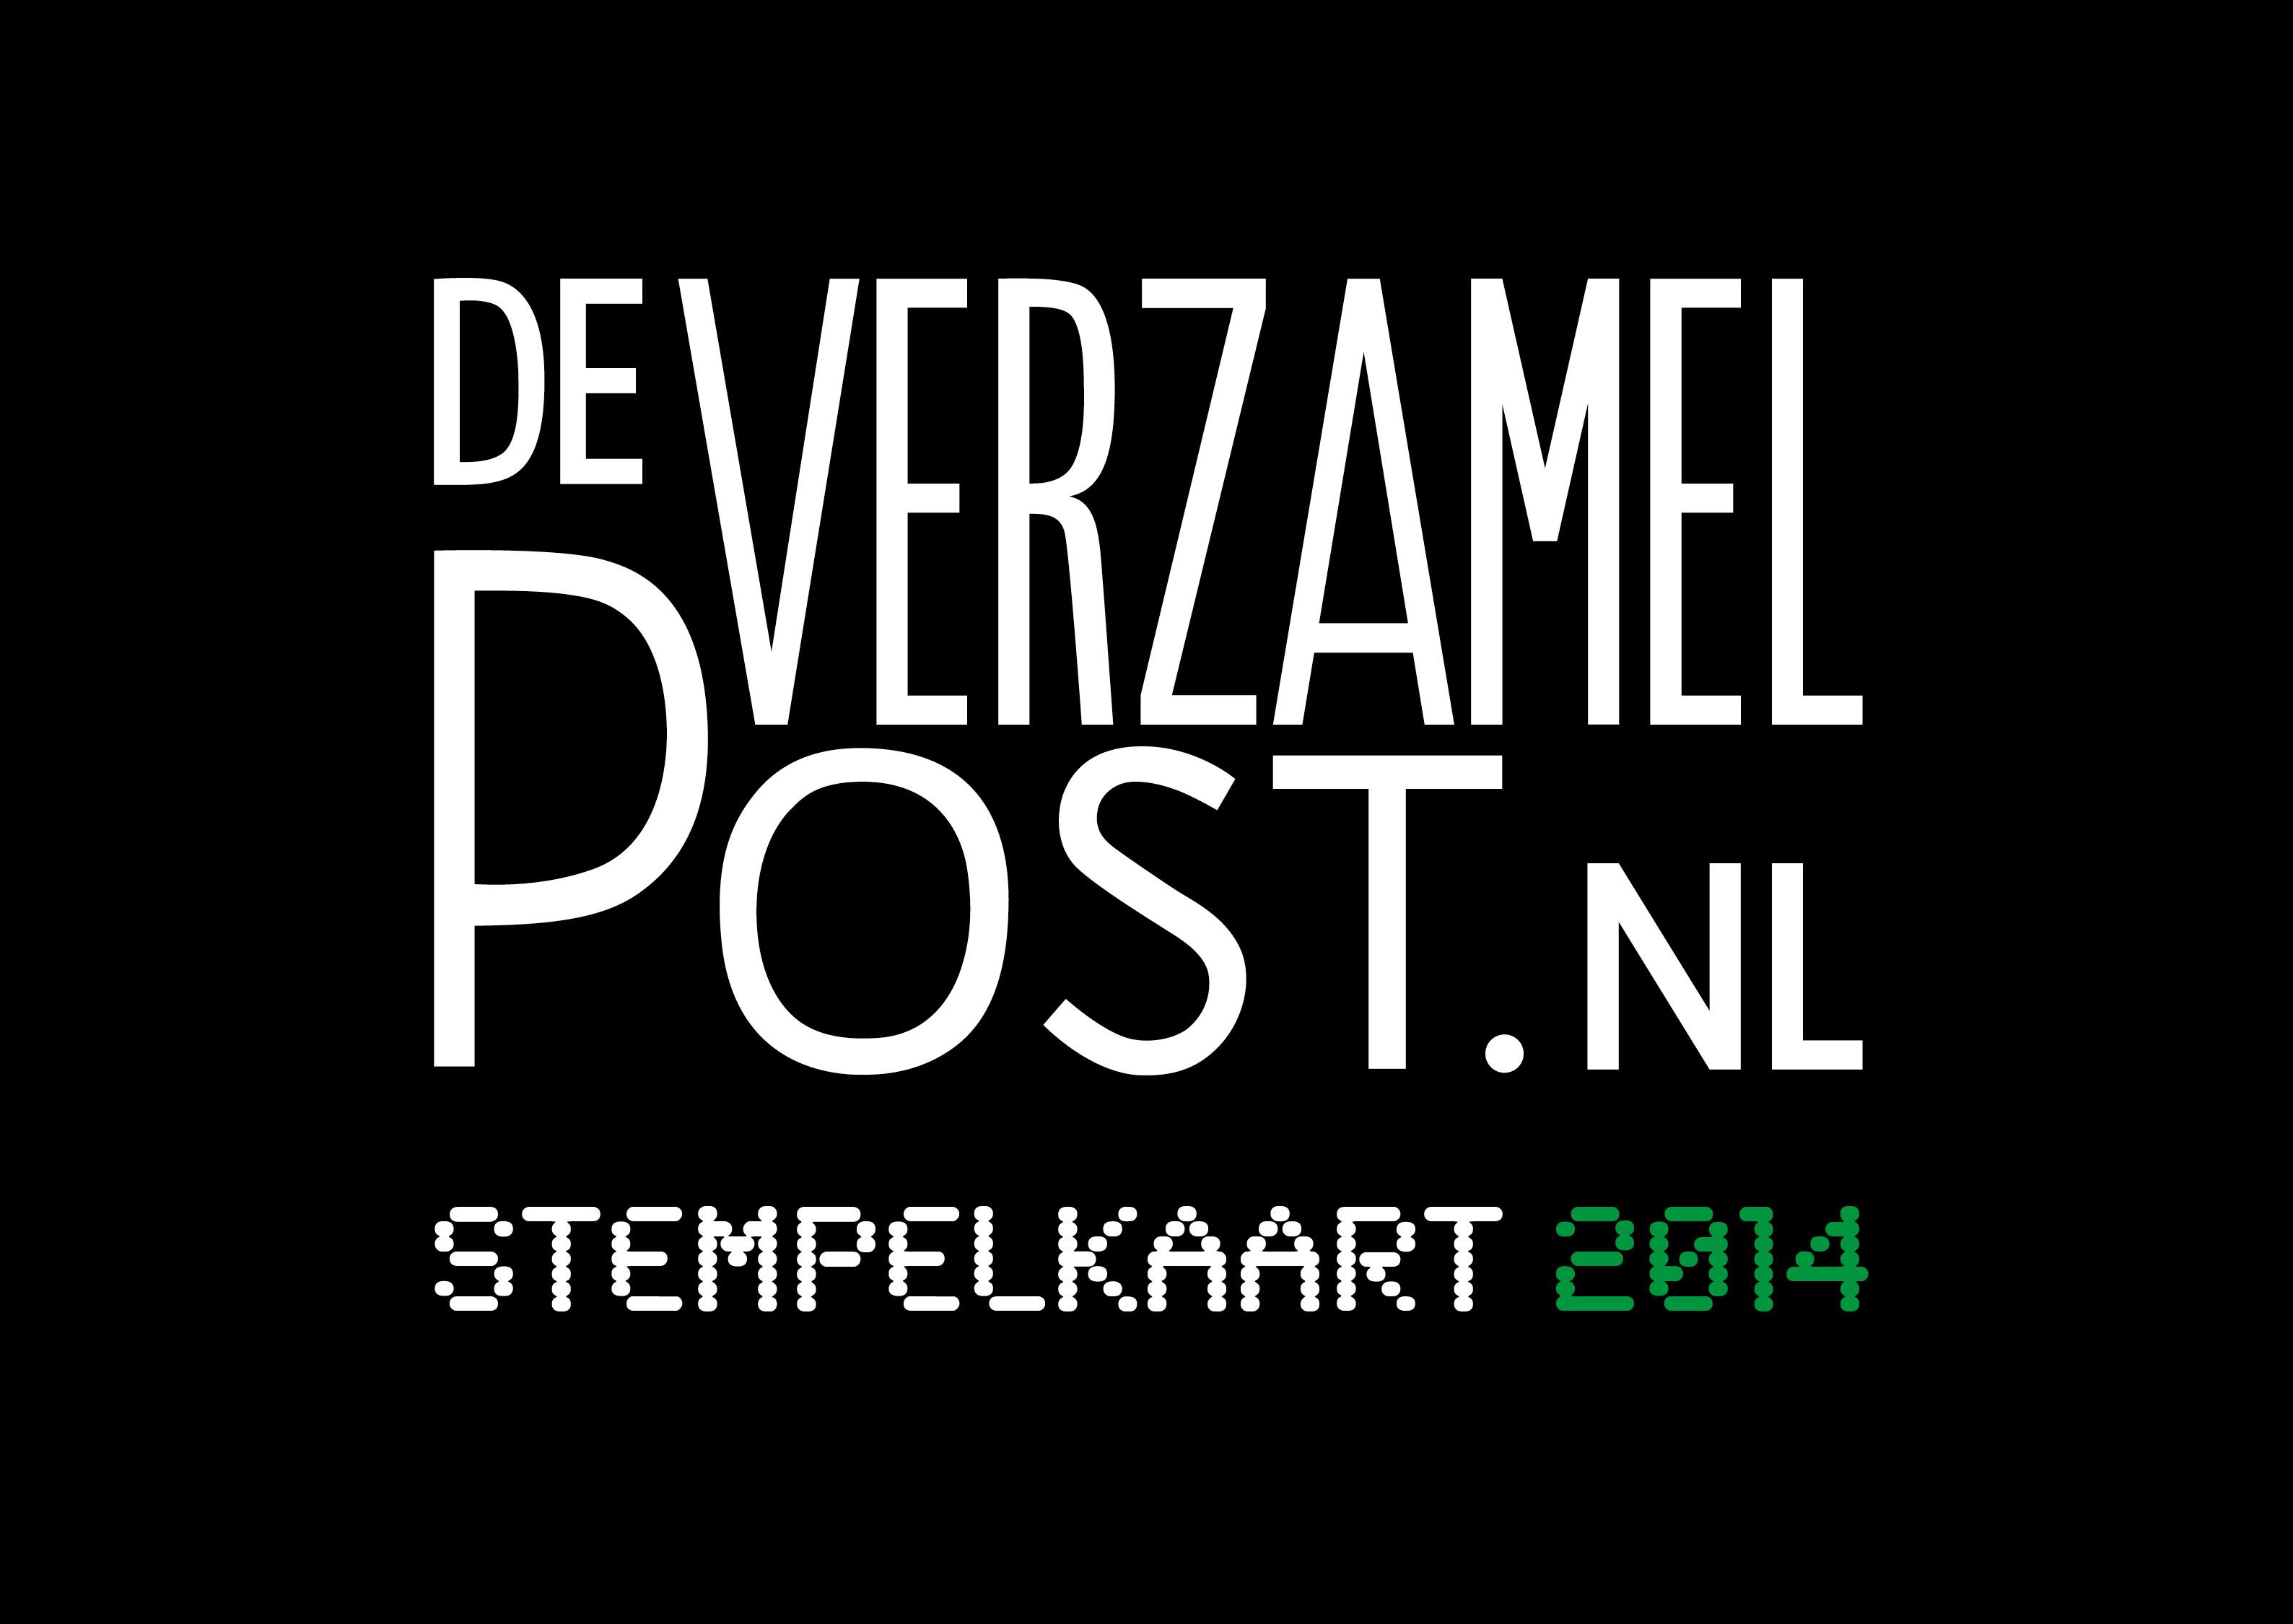 Image-DVP-Stempelkaart